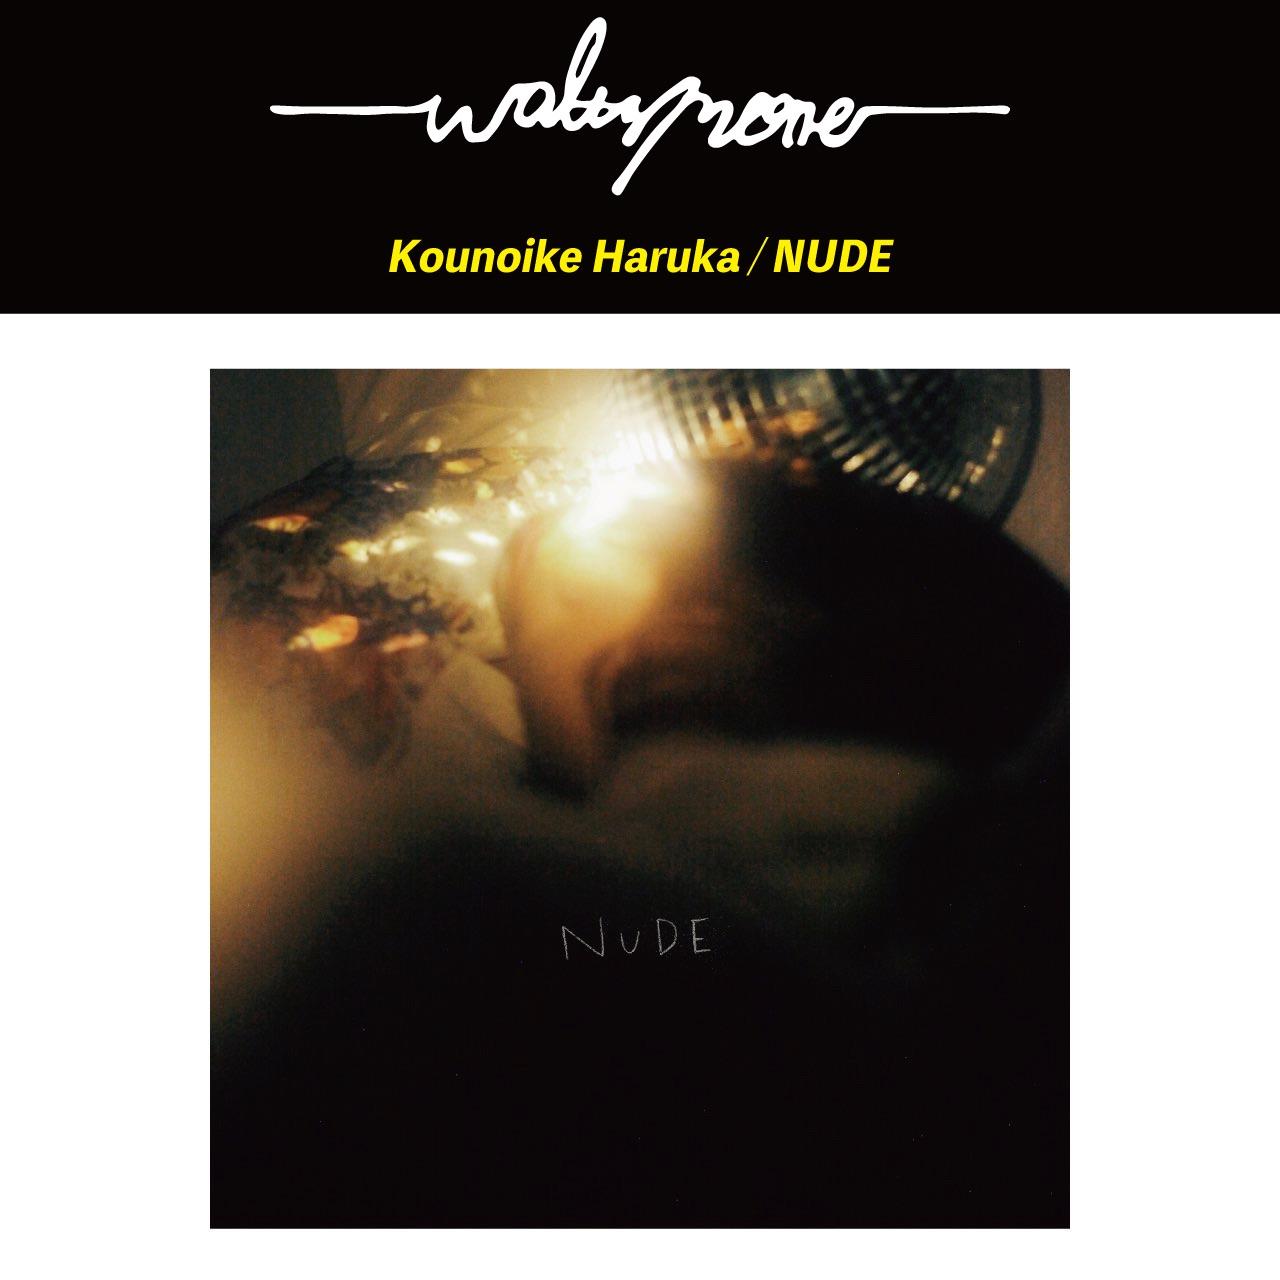 WALTZMORE Kounoike Haruka / NUDE